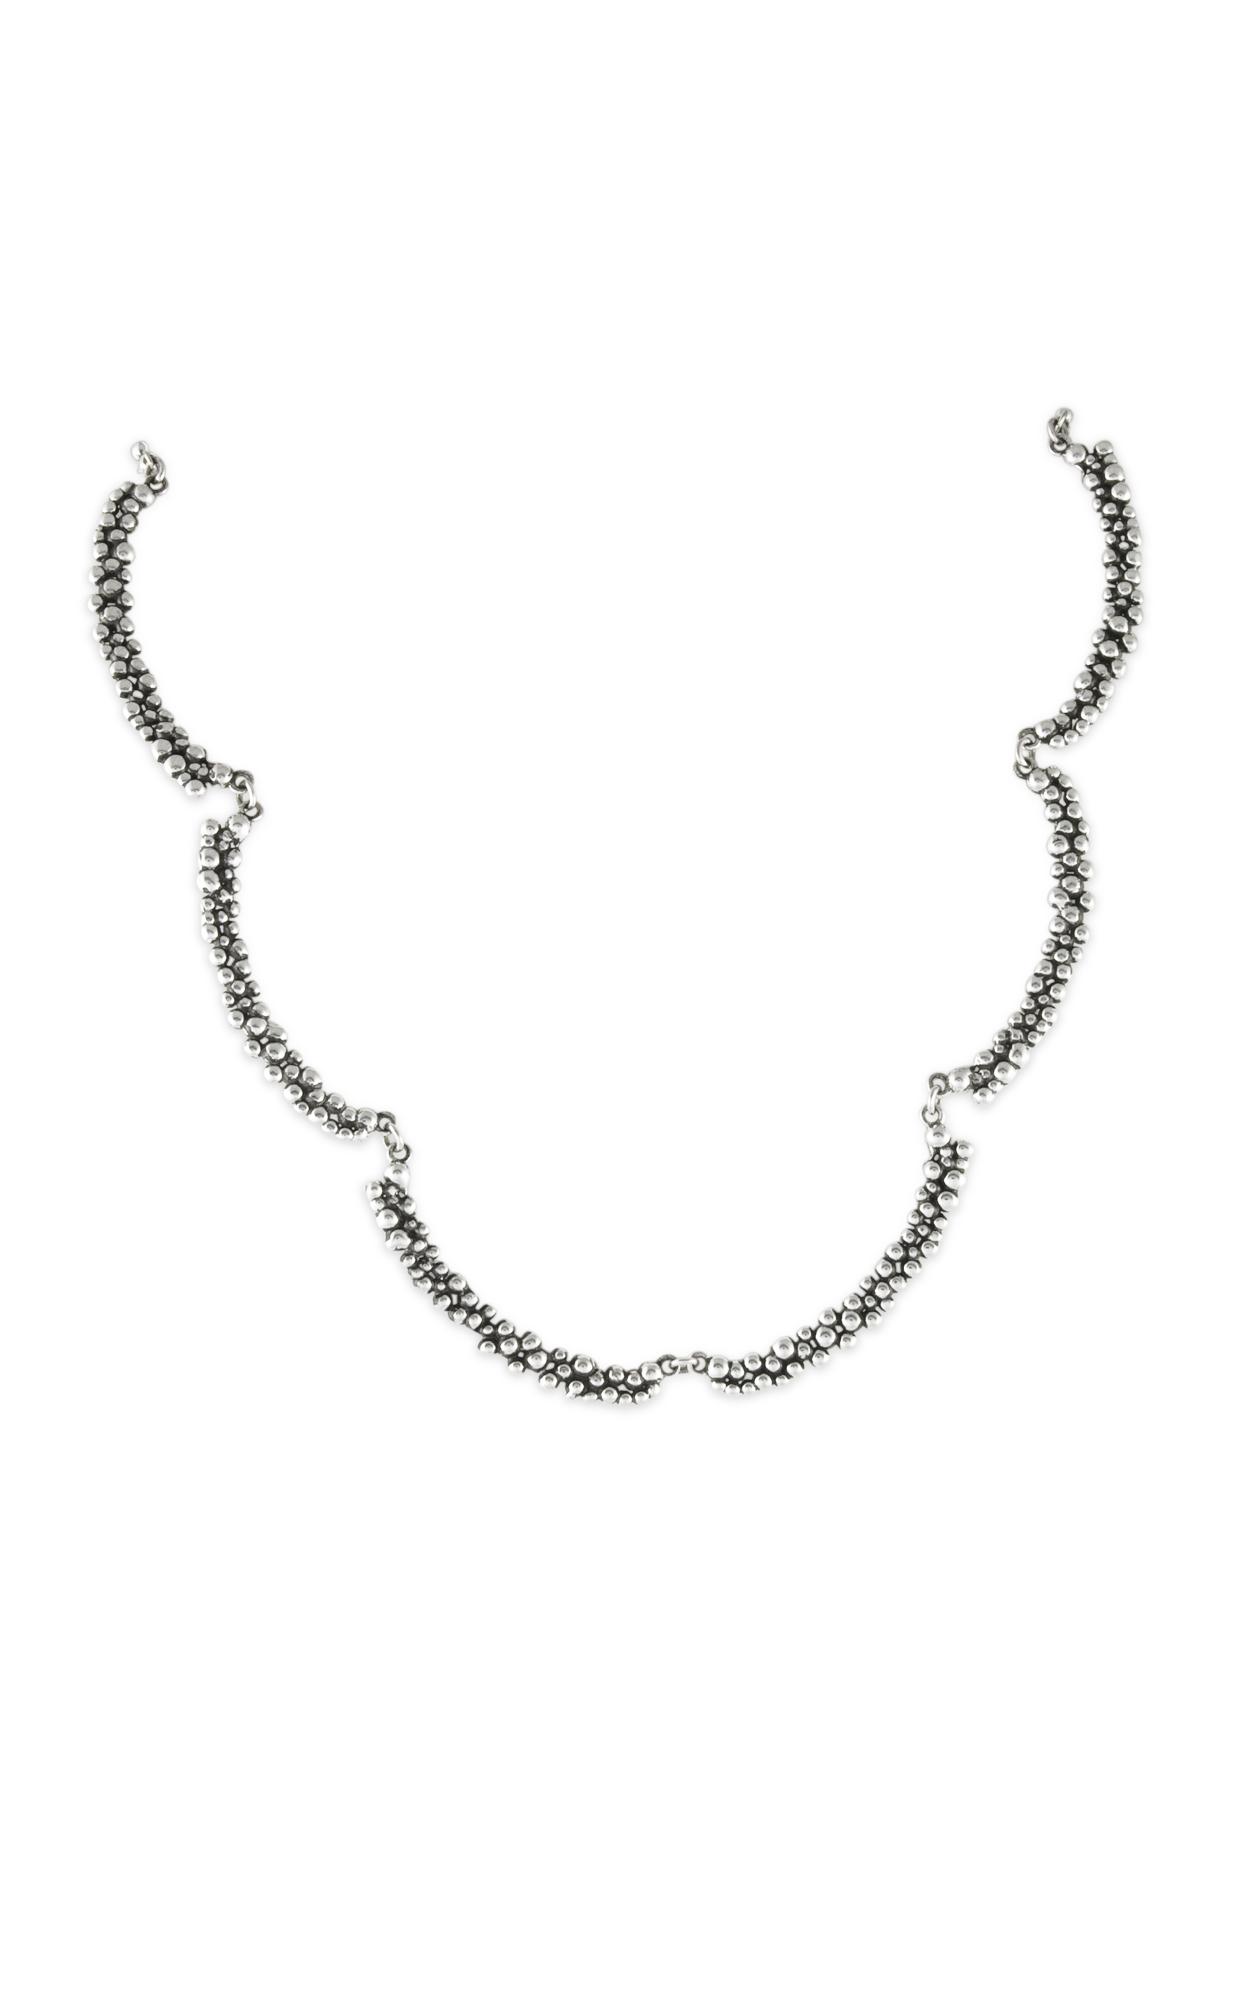 Zina Rain Necklace A1466-17 product image